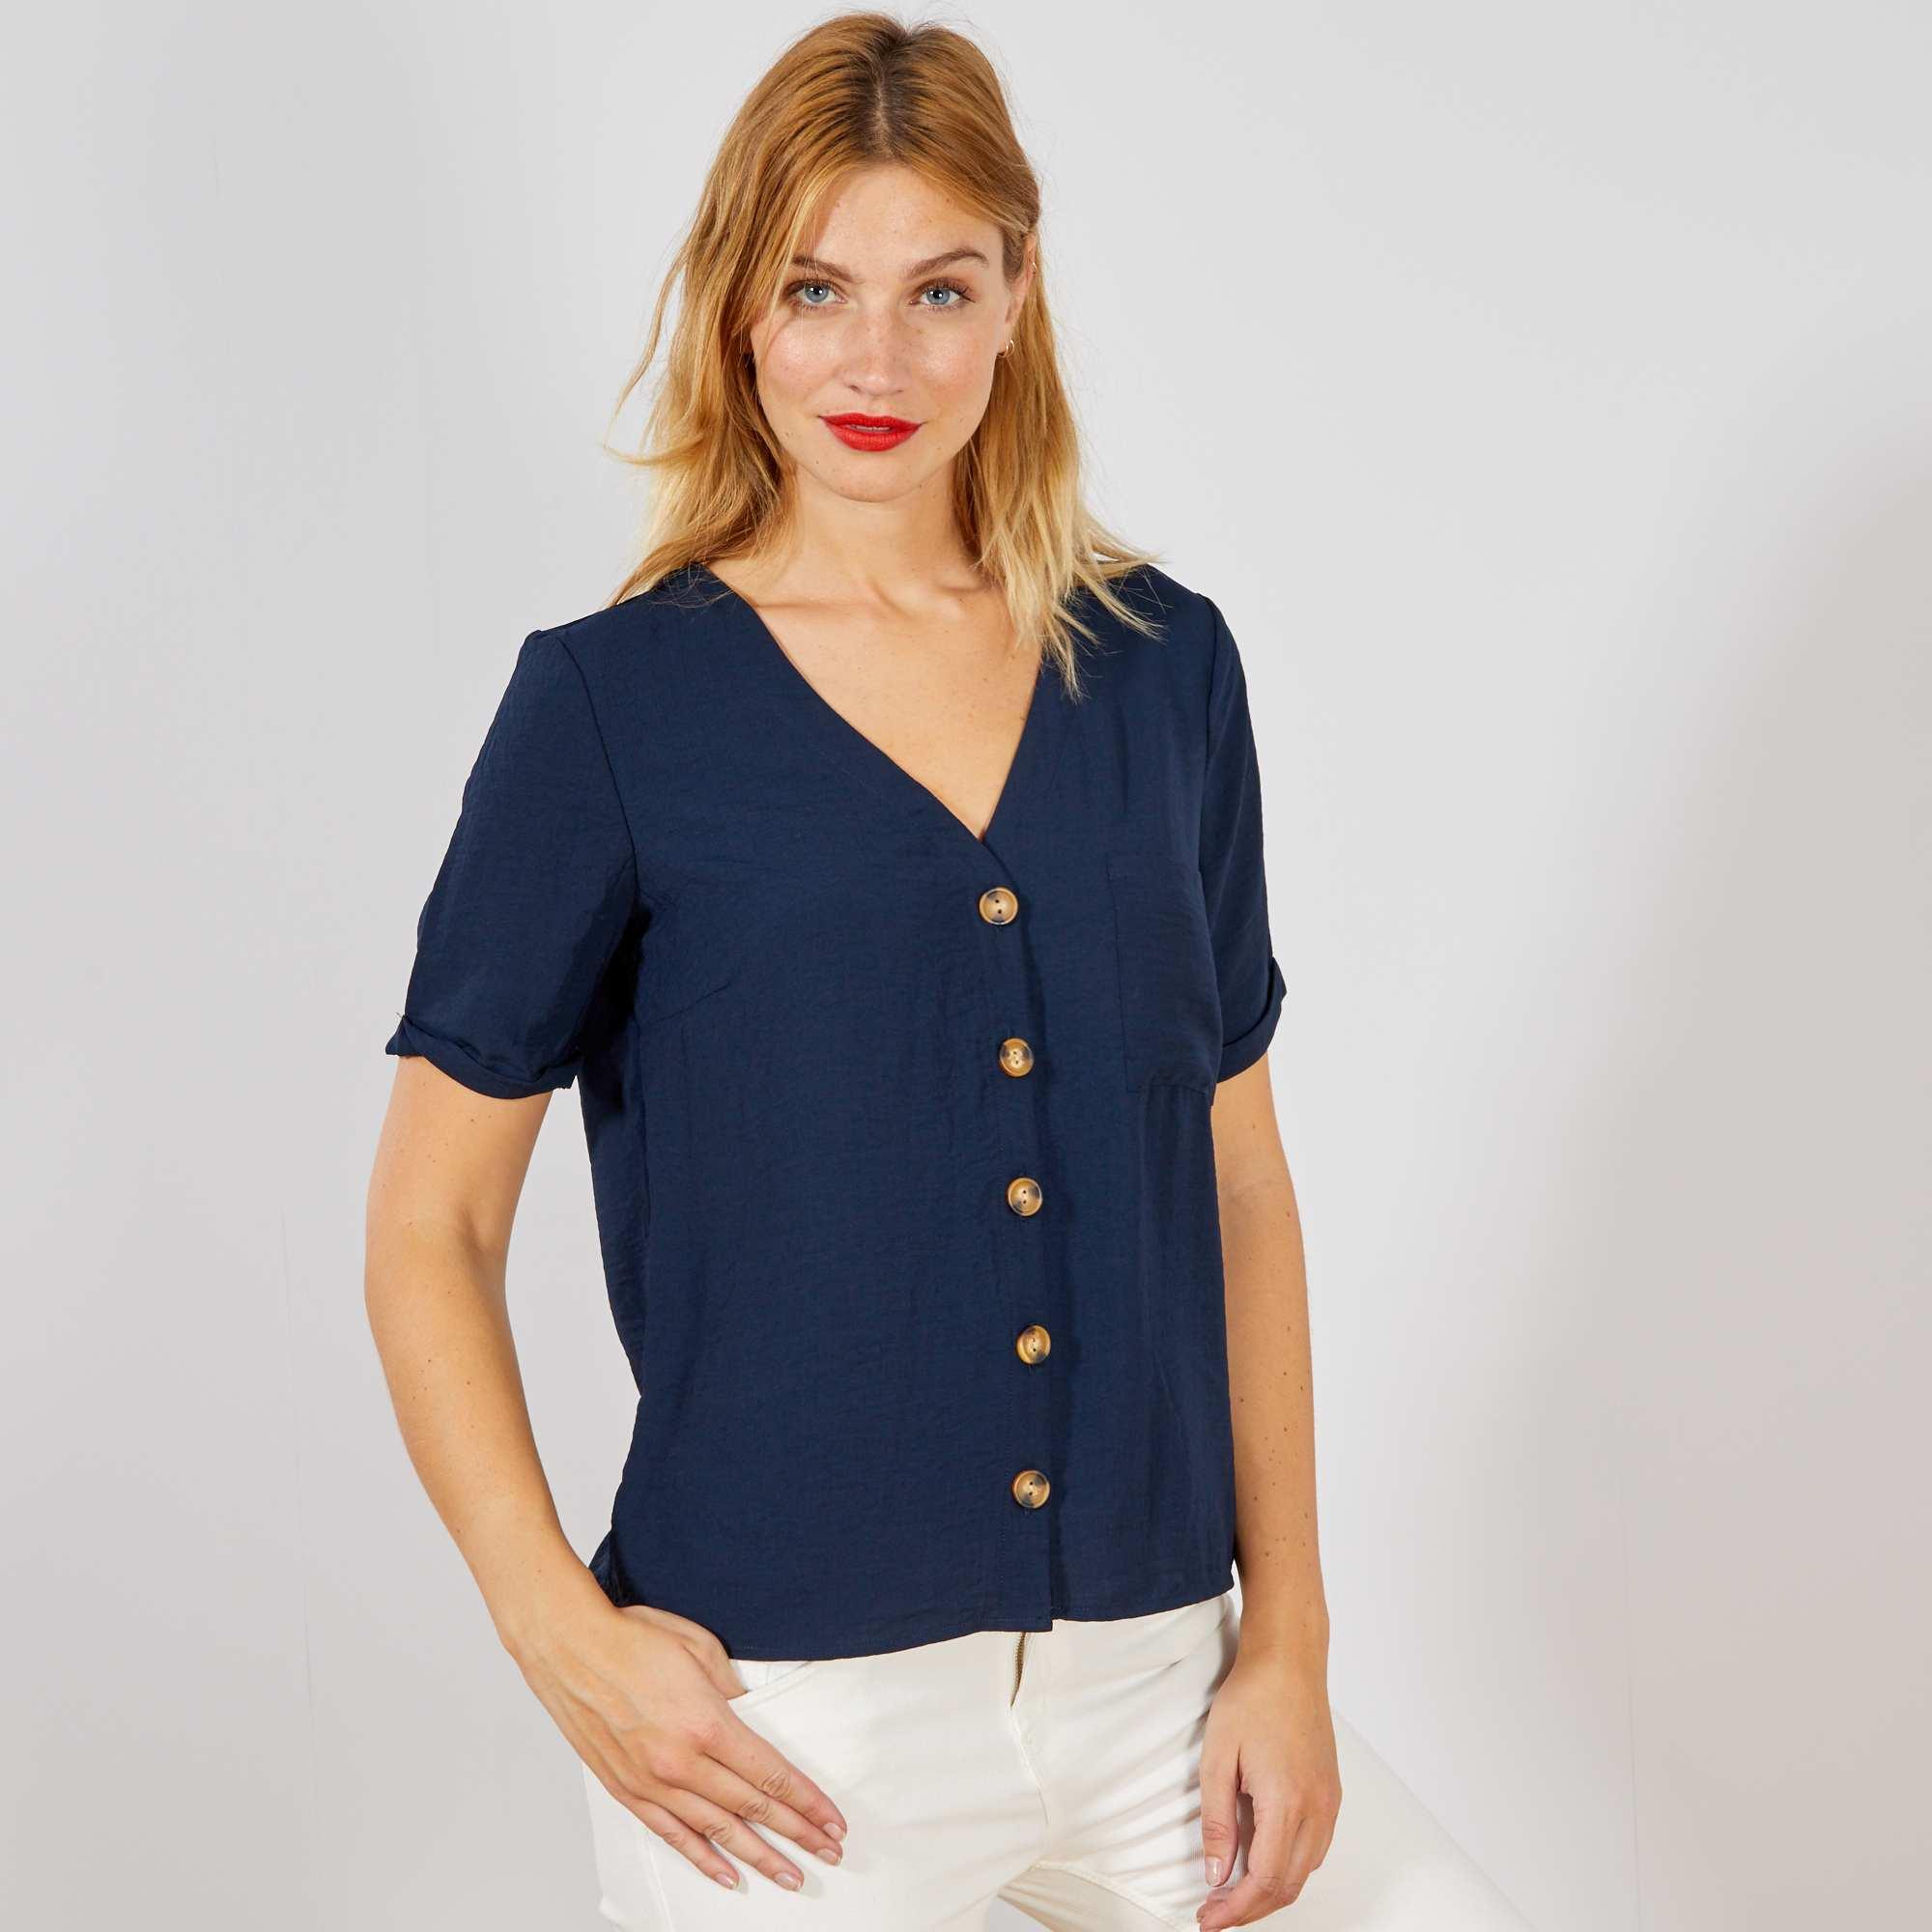 b4d60bb43c Blusa vaporosa con botones AZUL Mujer talla 34 a 48. Loading zoom